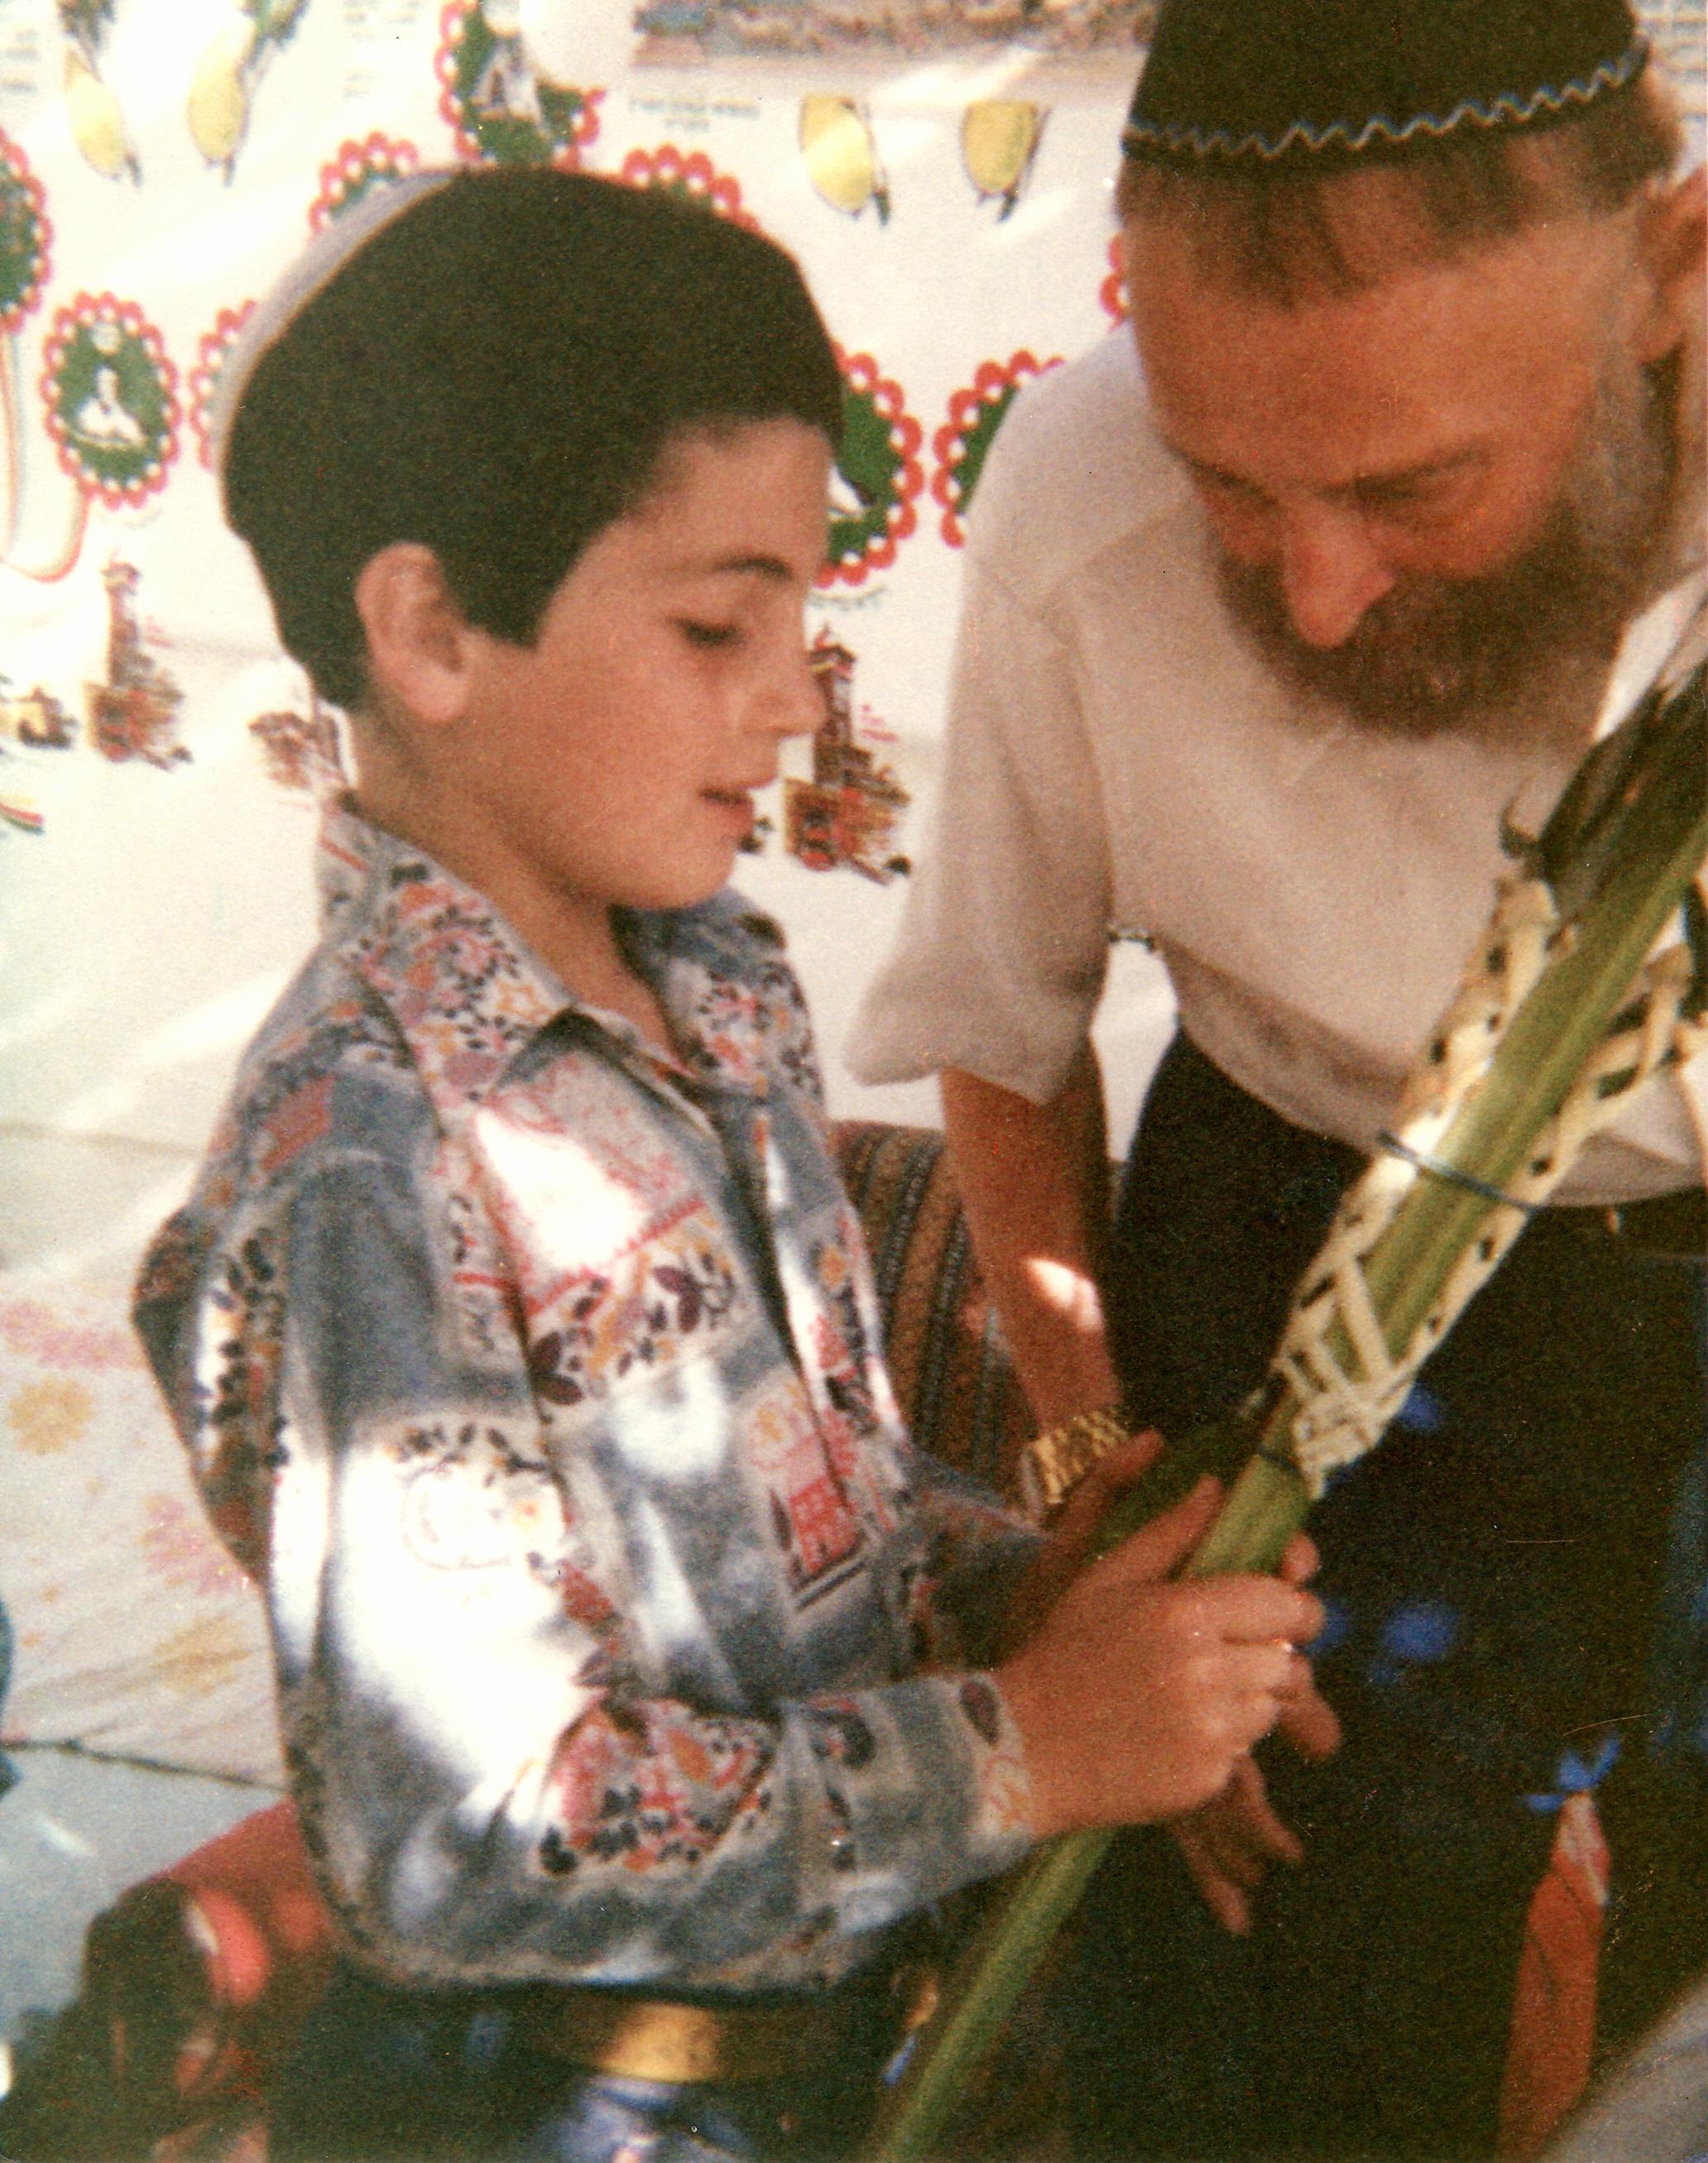 Figure 15 - Sukkot in Jerusalem with Rabbi Moshe Ben Meir, September 1977